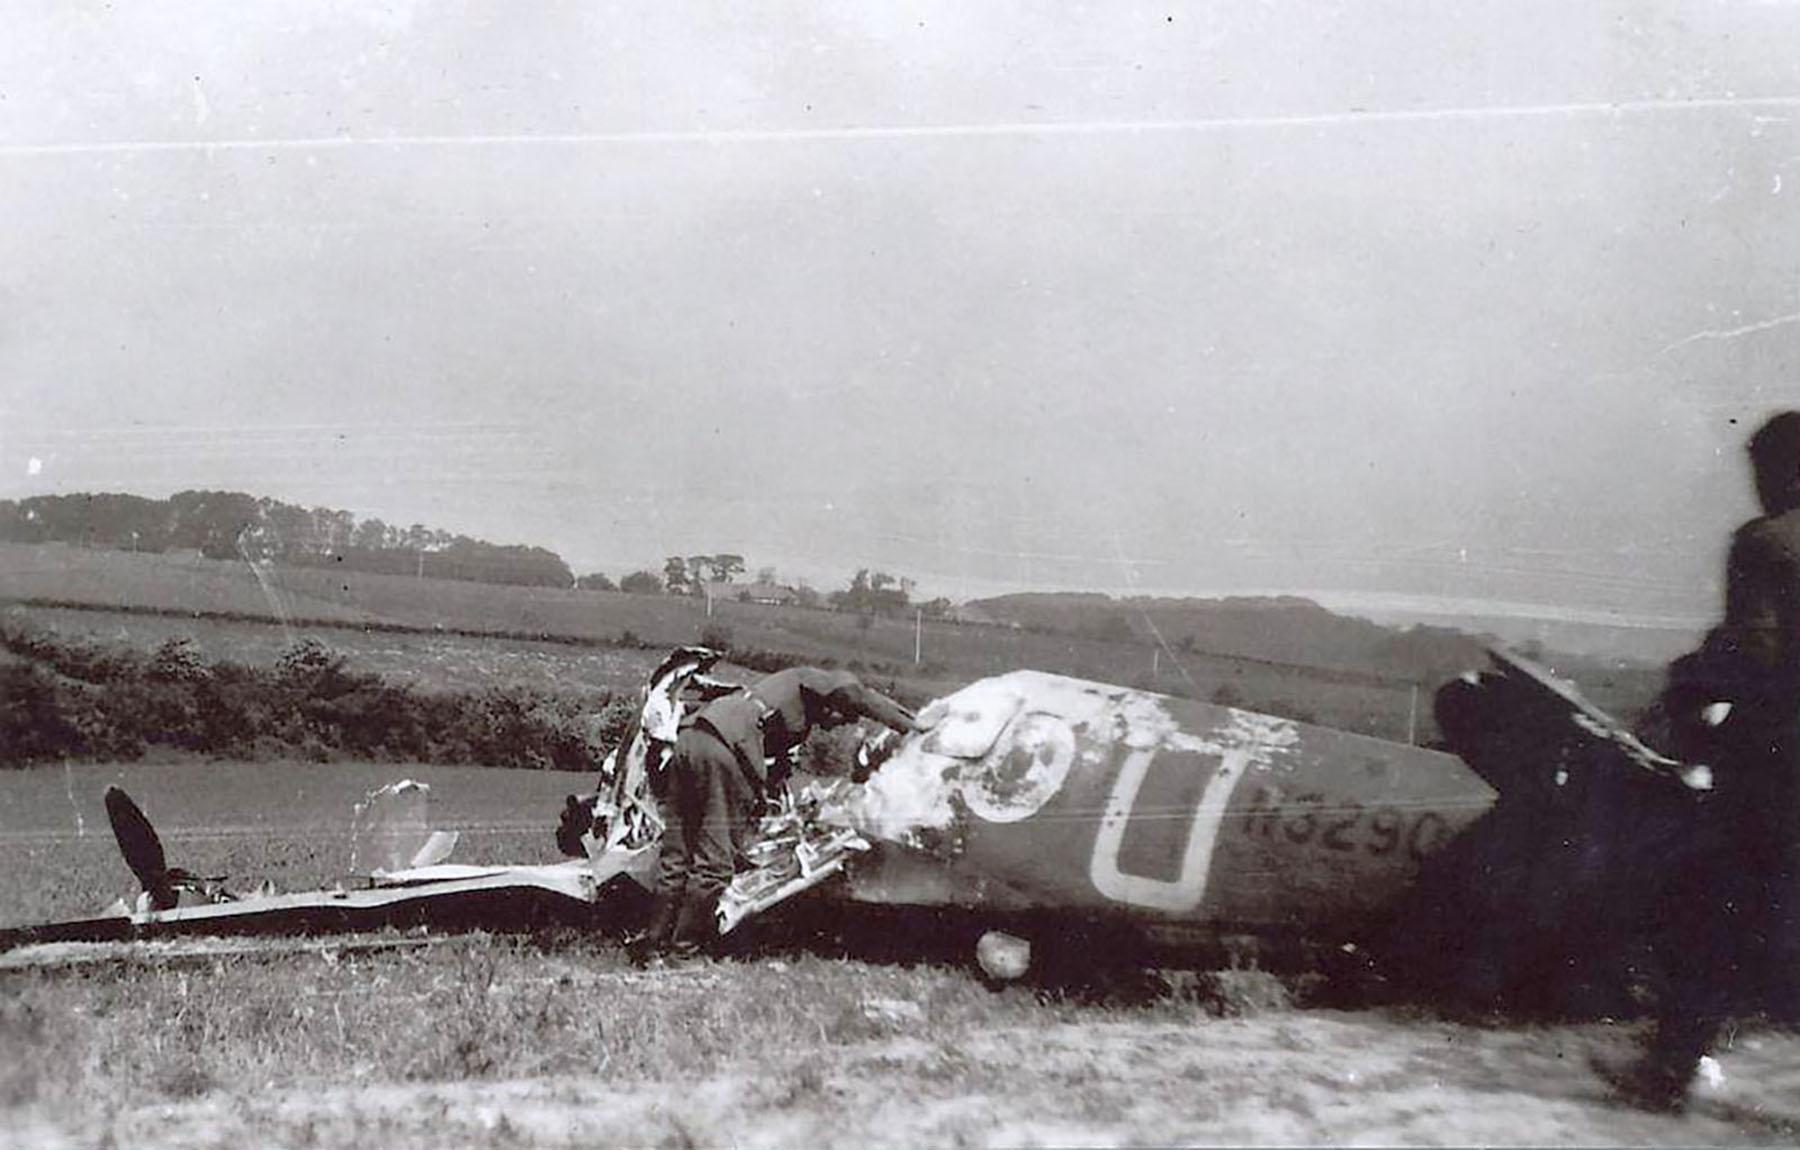 Spitfire MkIa RAF 92Sqn GRU N3290 PO J Gillies POW sd by Bf 110s near Calais 23rd May 1940 01